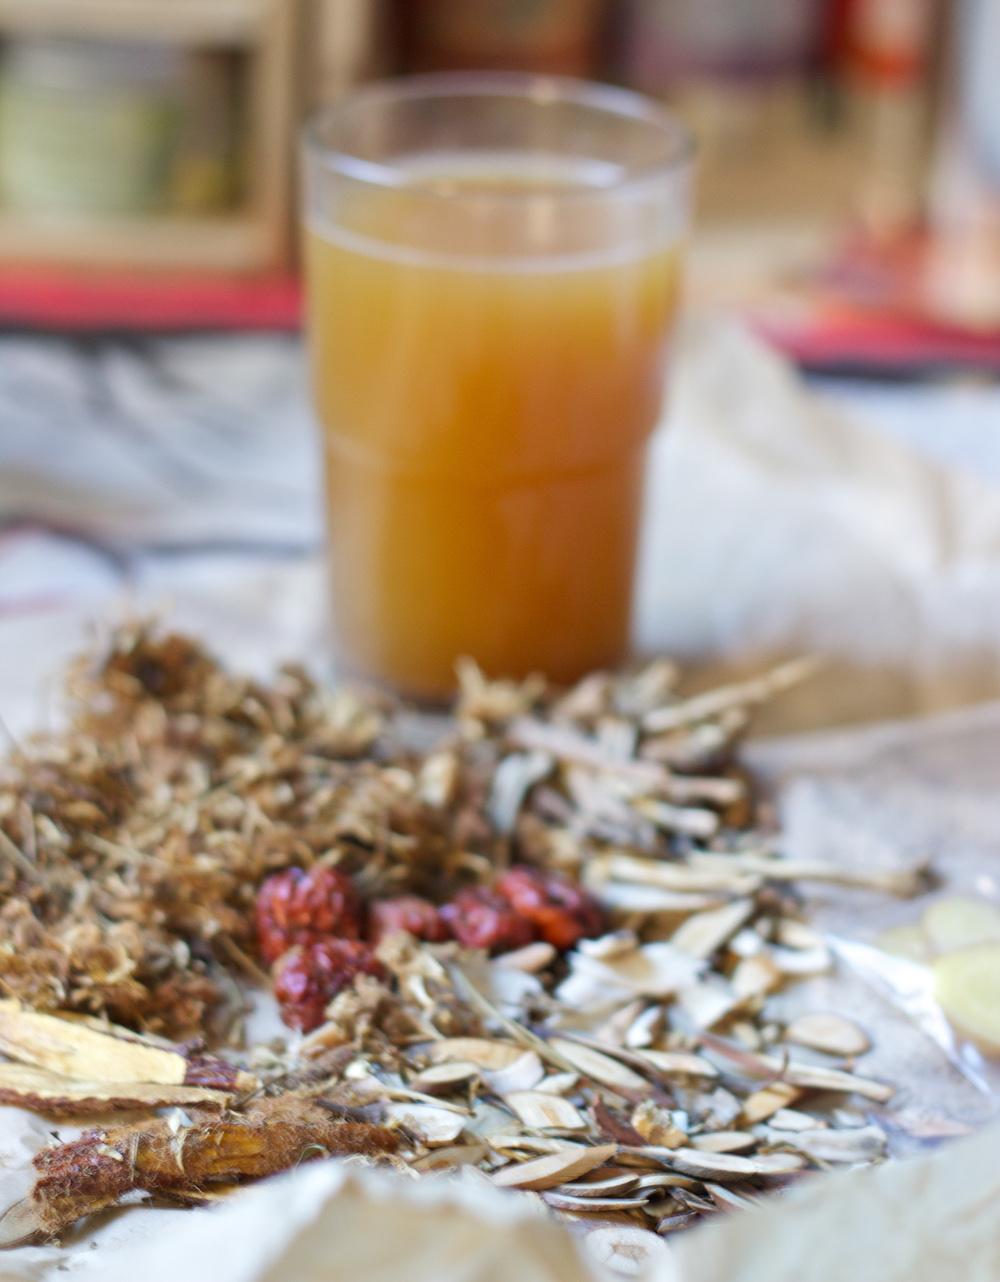 gui zhi tang cinnamon twig decoction herbs